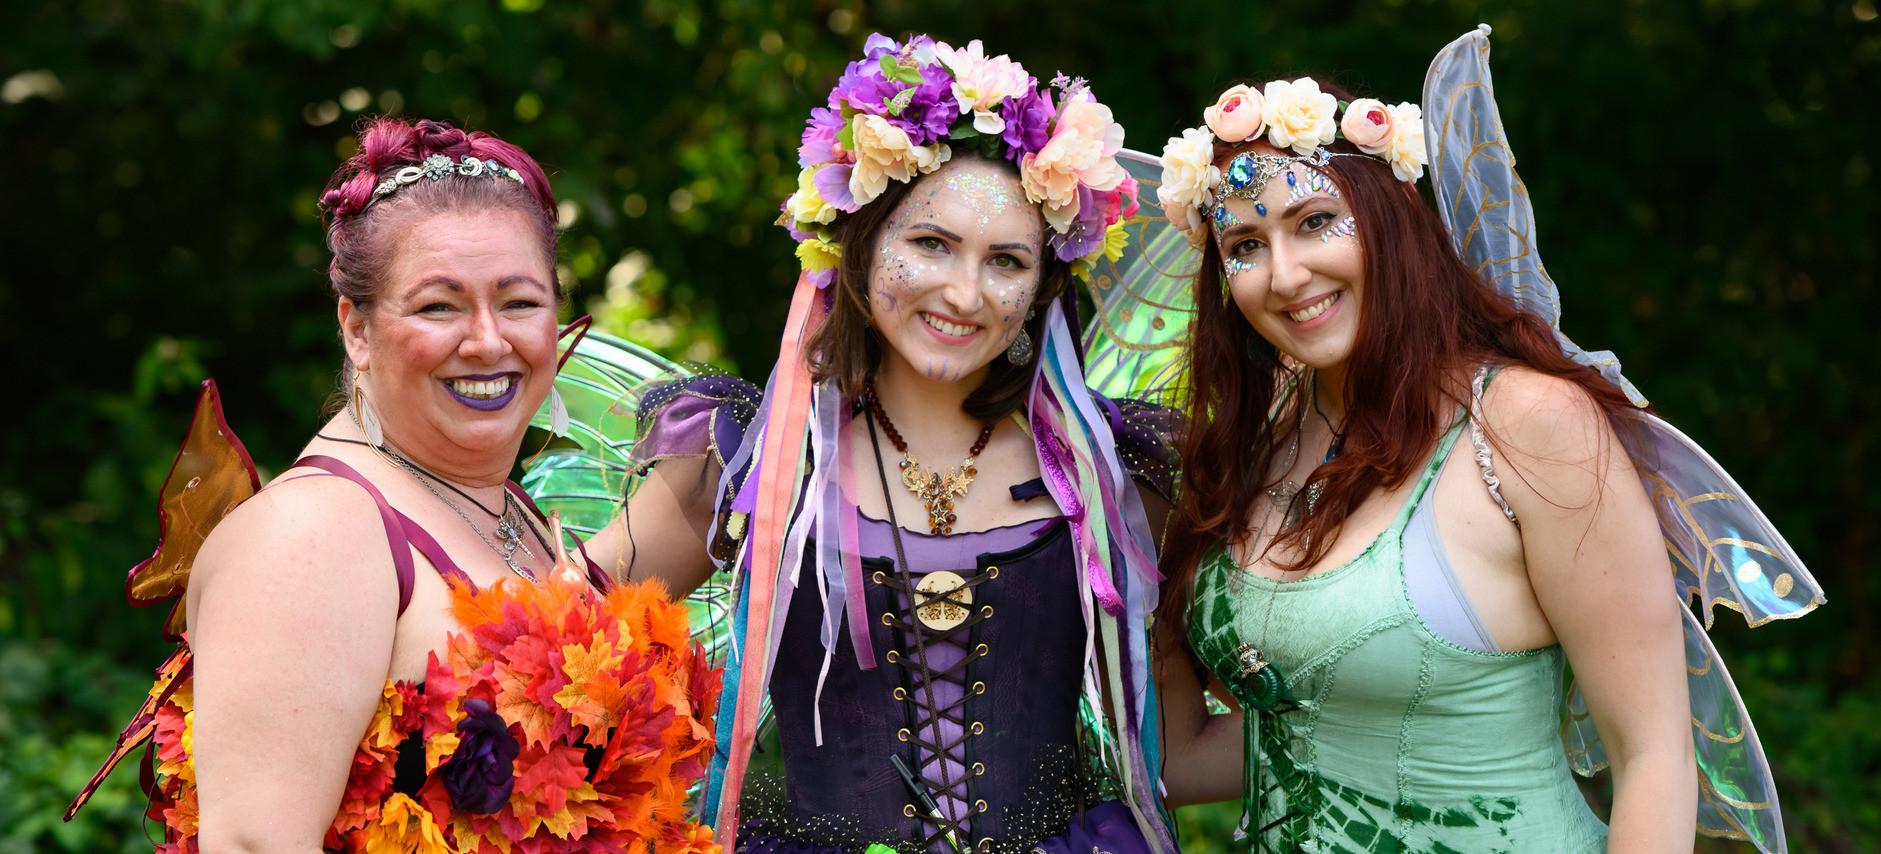 Woodland & Friends at the Virginia Fairy Festival